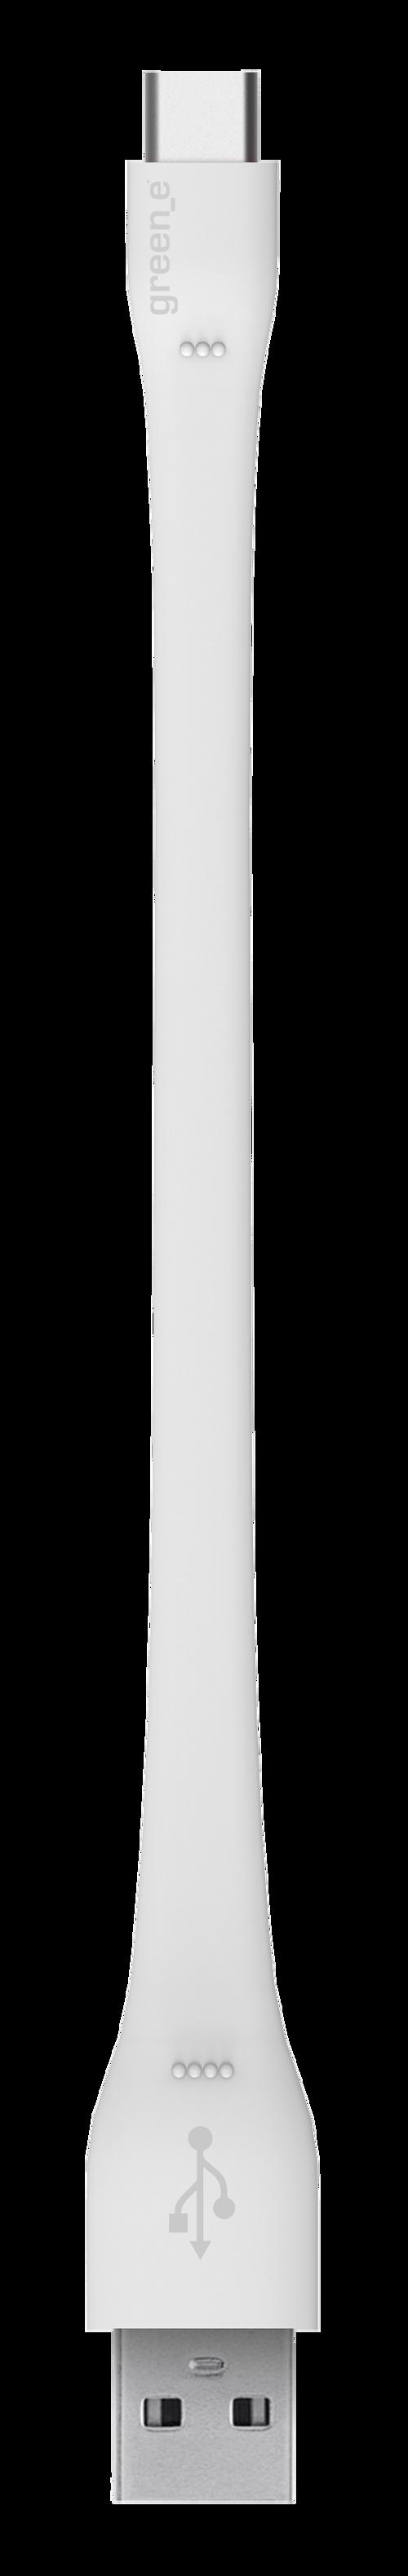 CORDON SYNCHRO + CHARGE USB/USB TYPE C 15CM BLANC gr7040-2